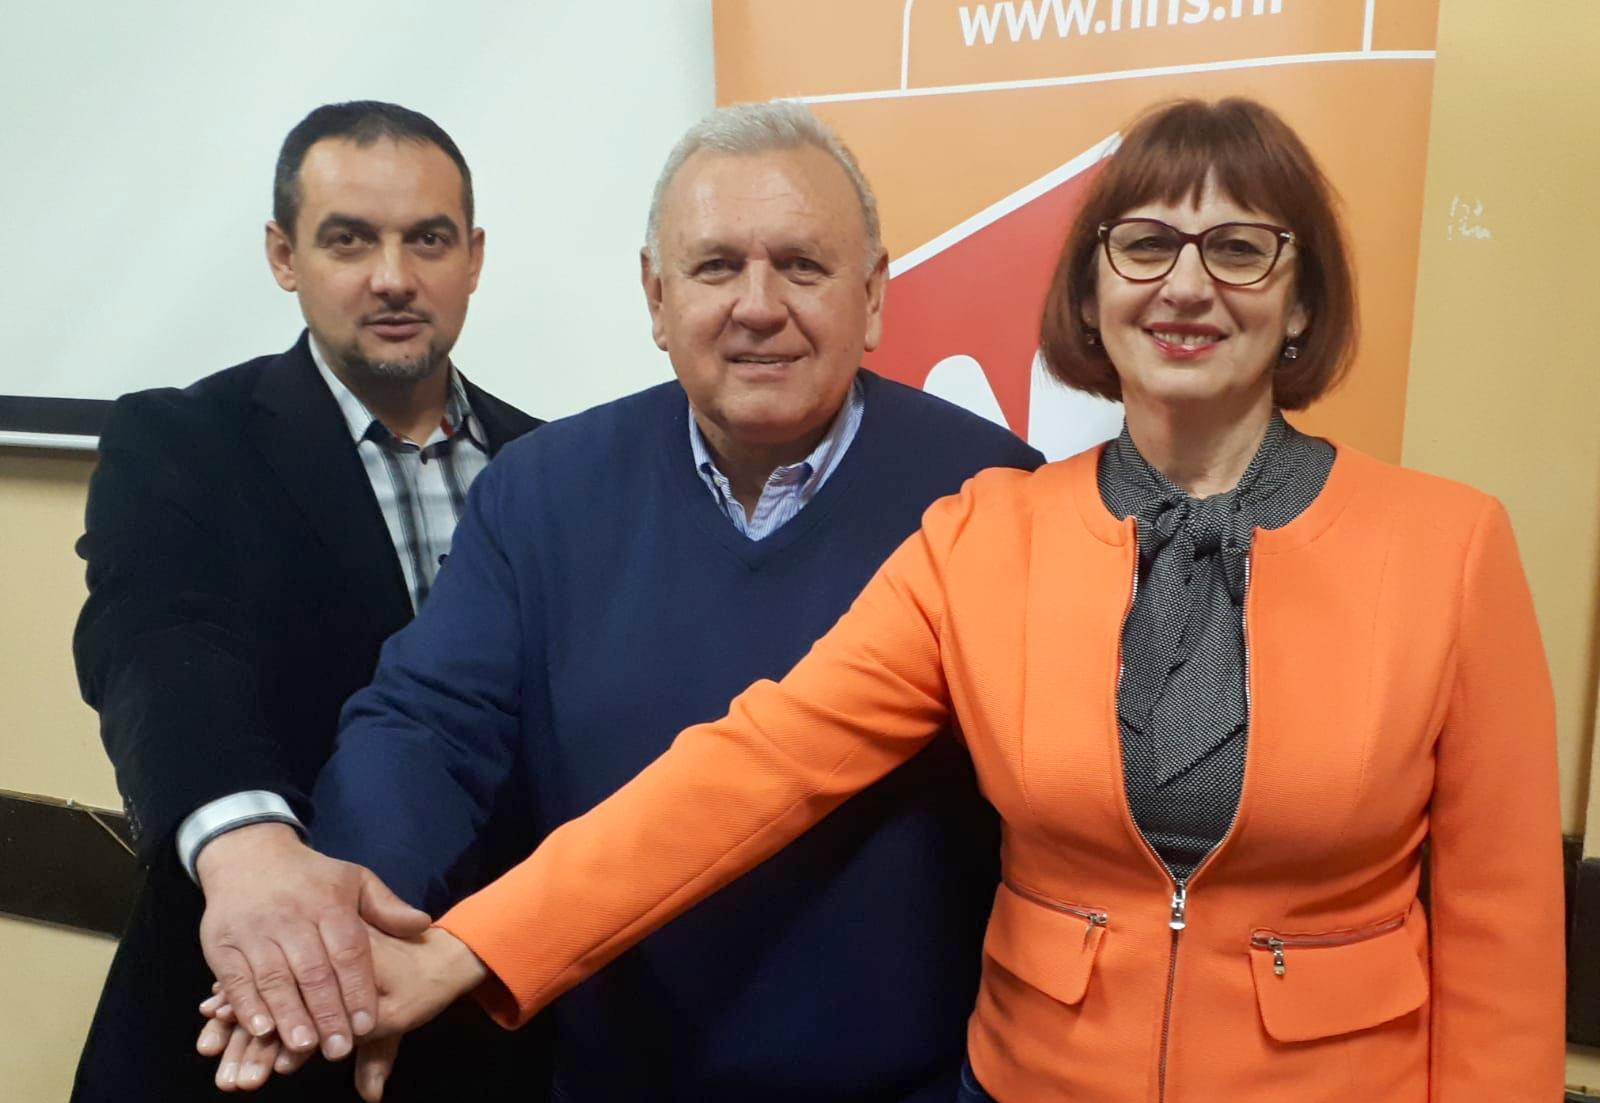 NEVEN ALIĆ novi predsjednik HNS-a Bjelovarsko-bilogorske županje